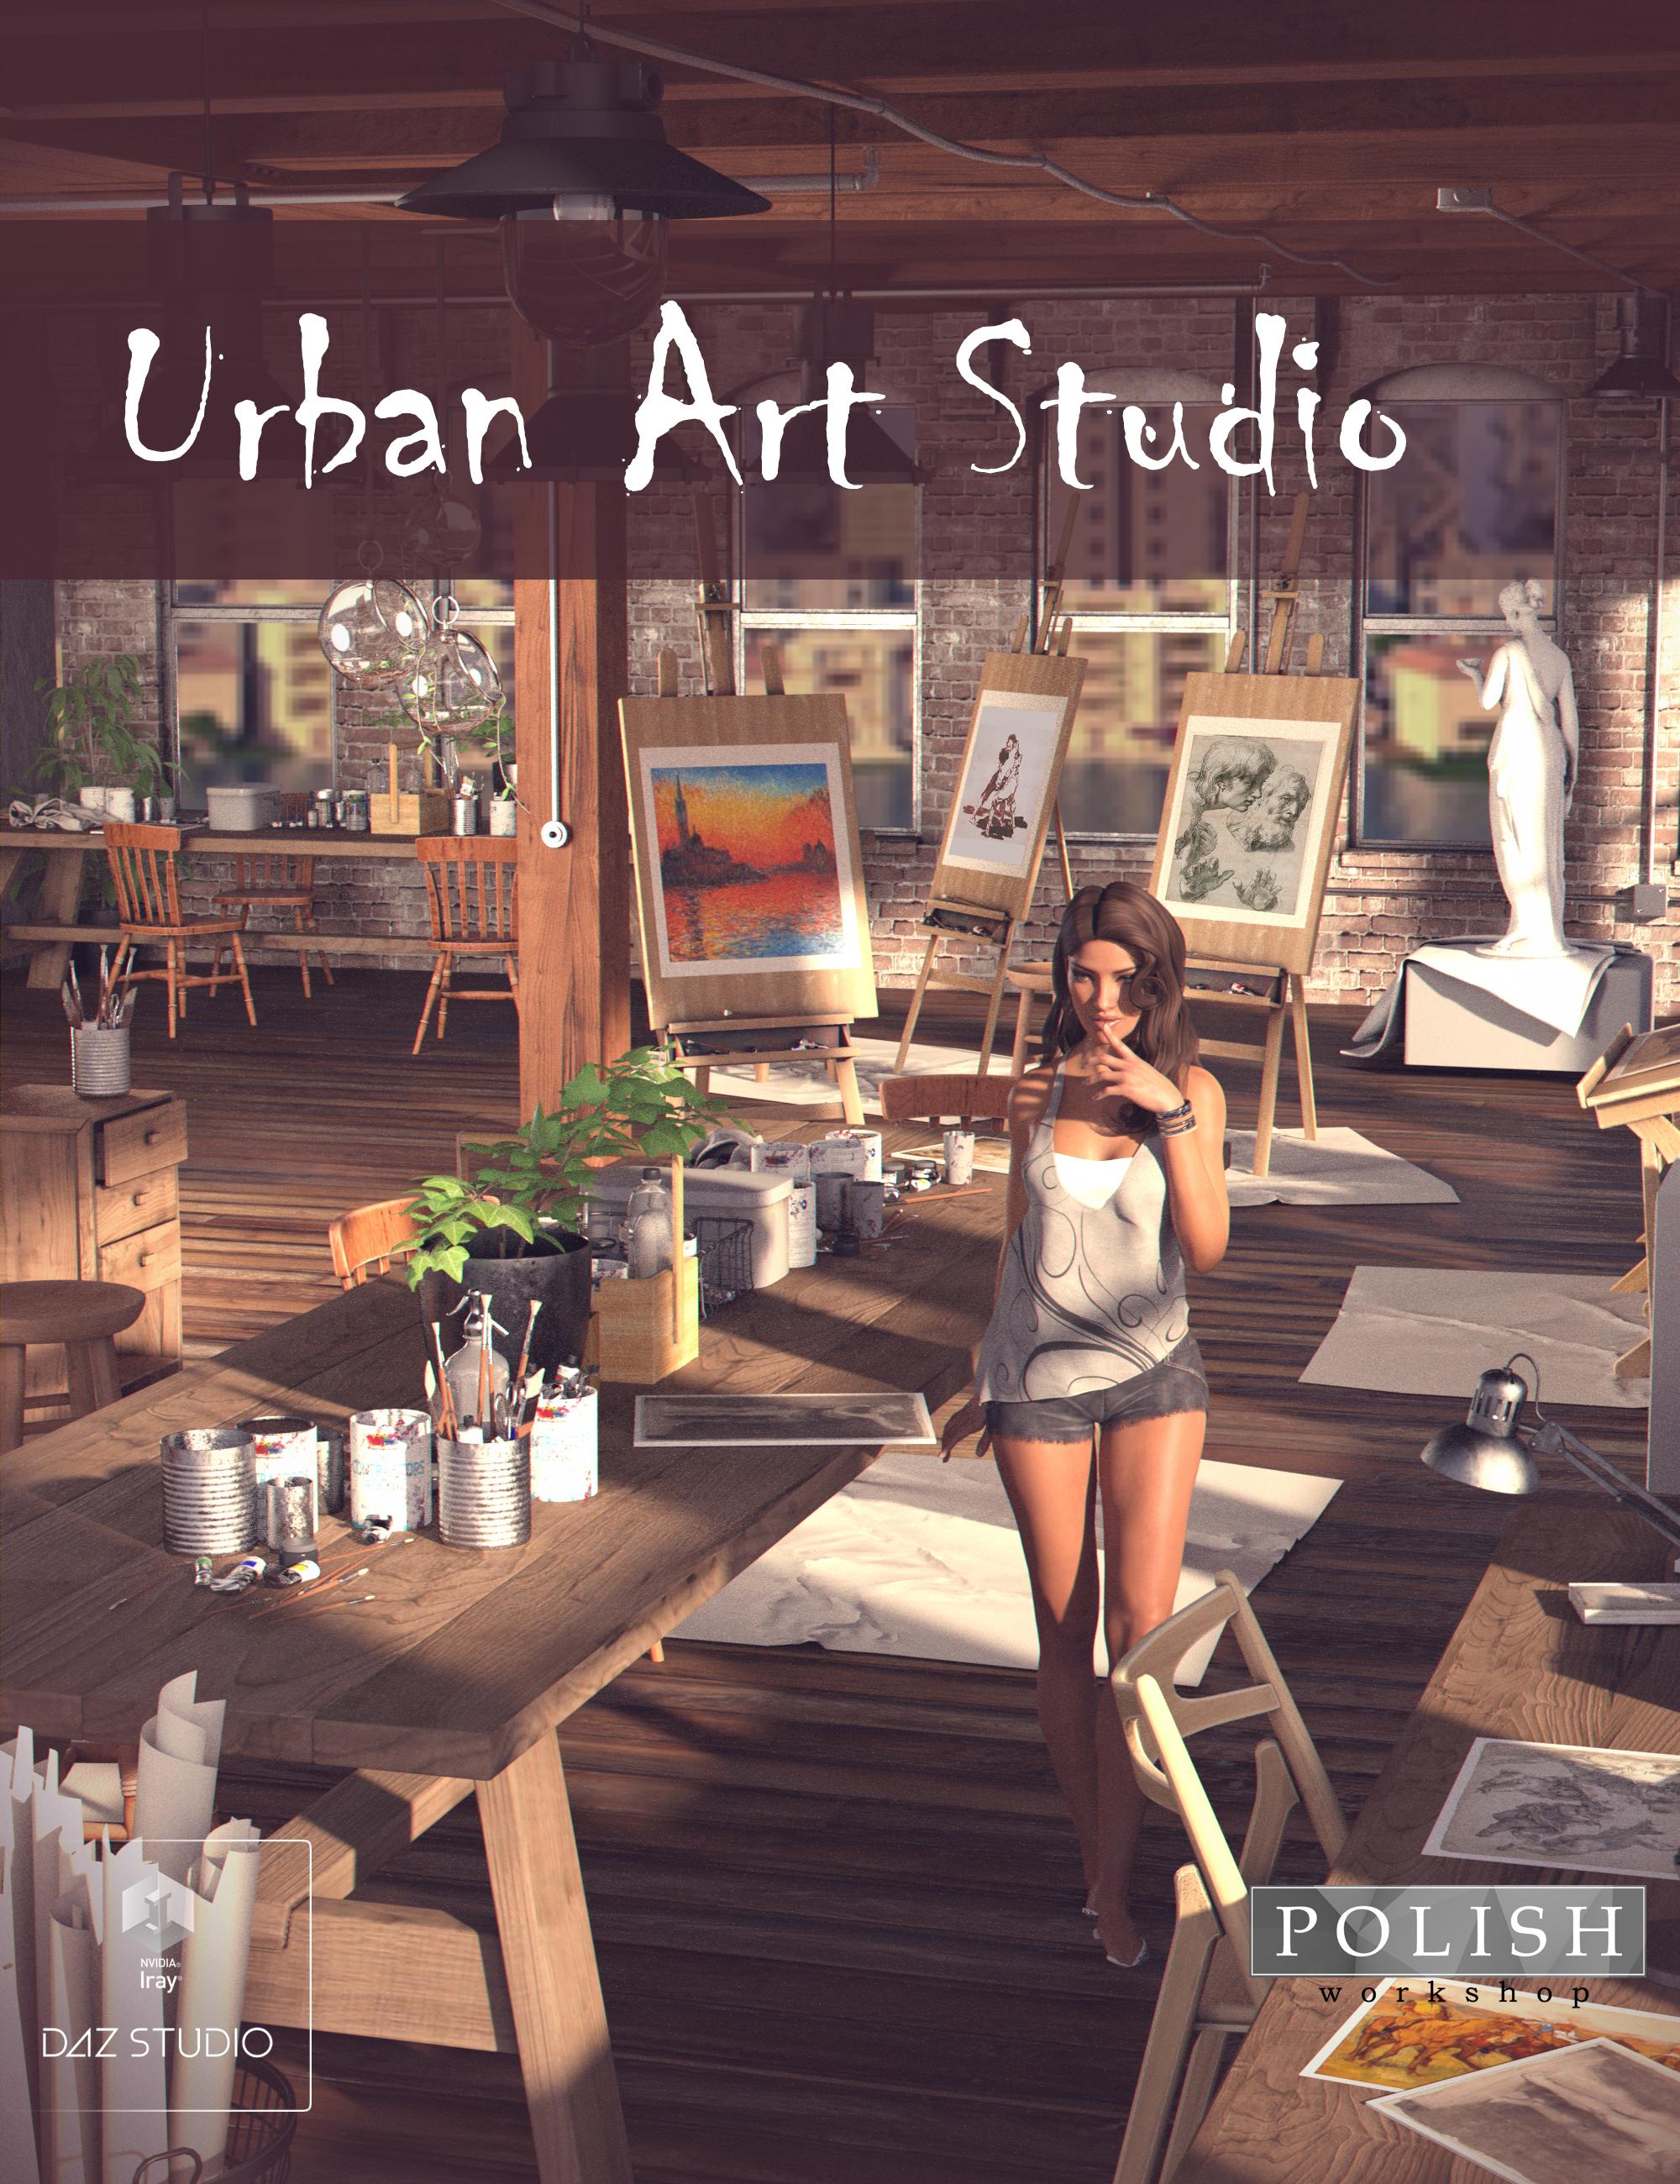 Urban Art Studio by: Polish, 3D Models by Daz 3D